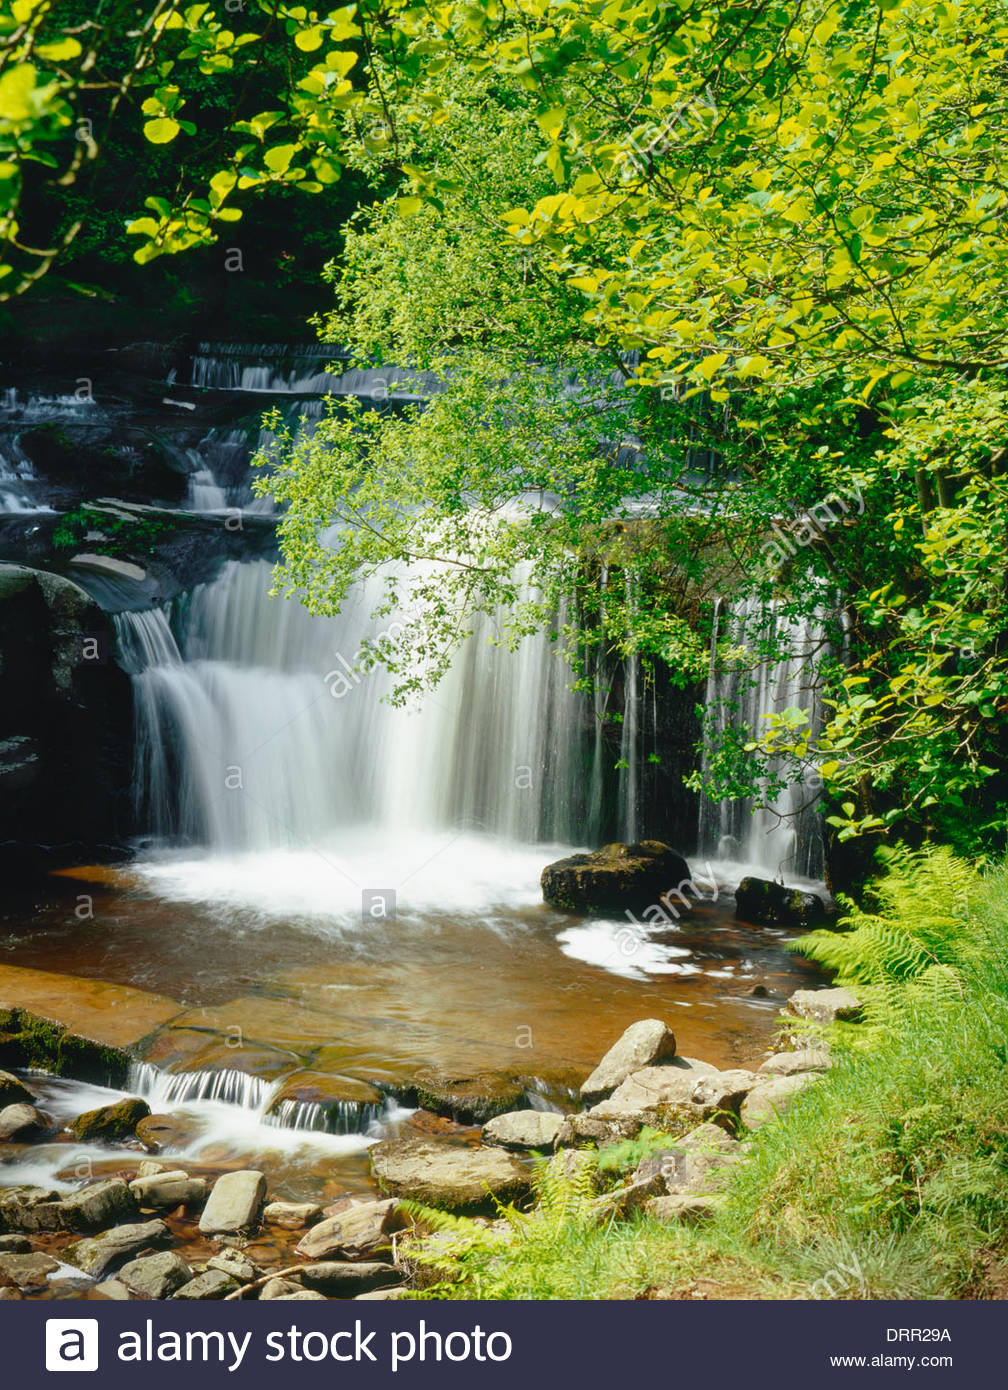 Brecon Beacons National Park; Waterfalls at Blaen-y-glyn, Torpantau Powys Wales UK - Stock Image